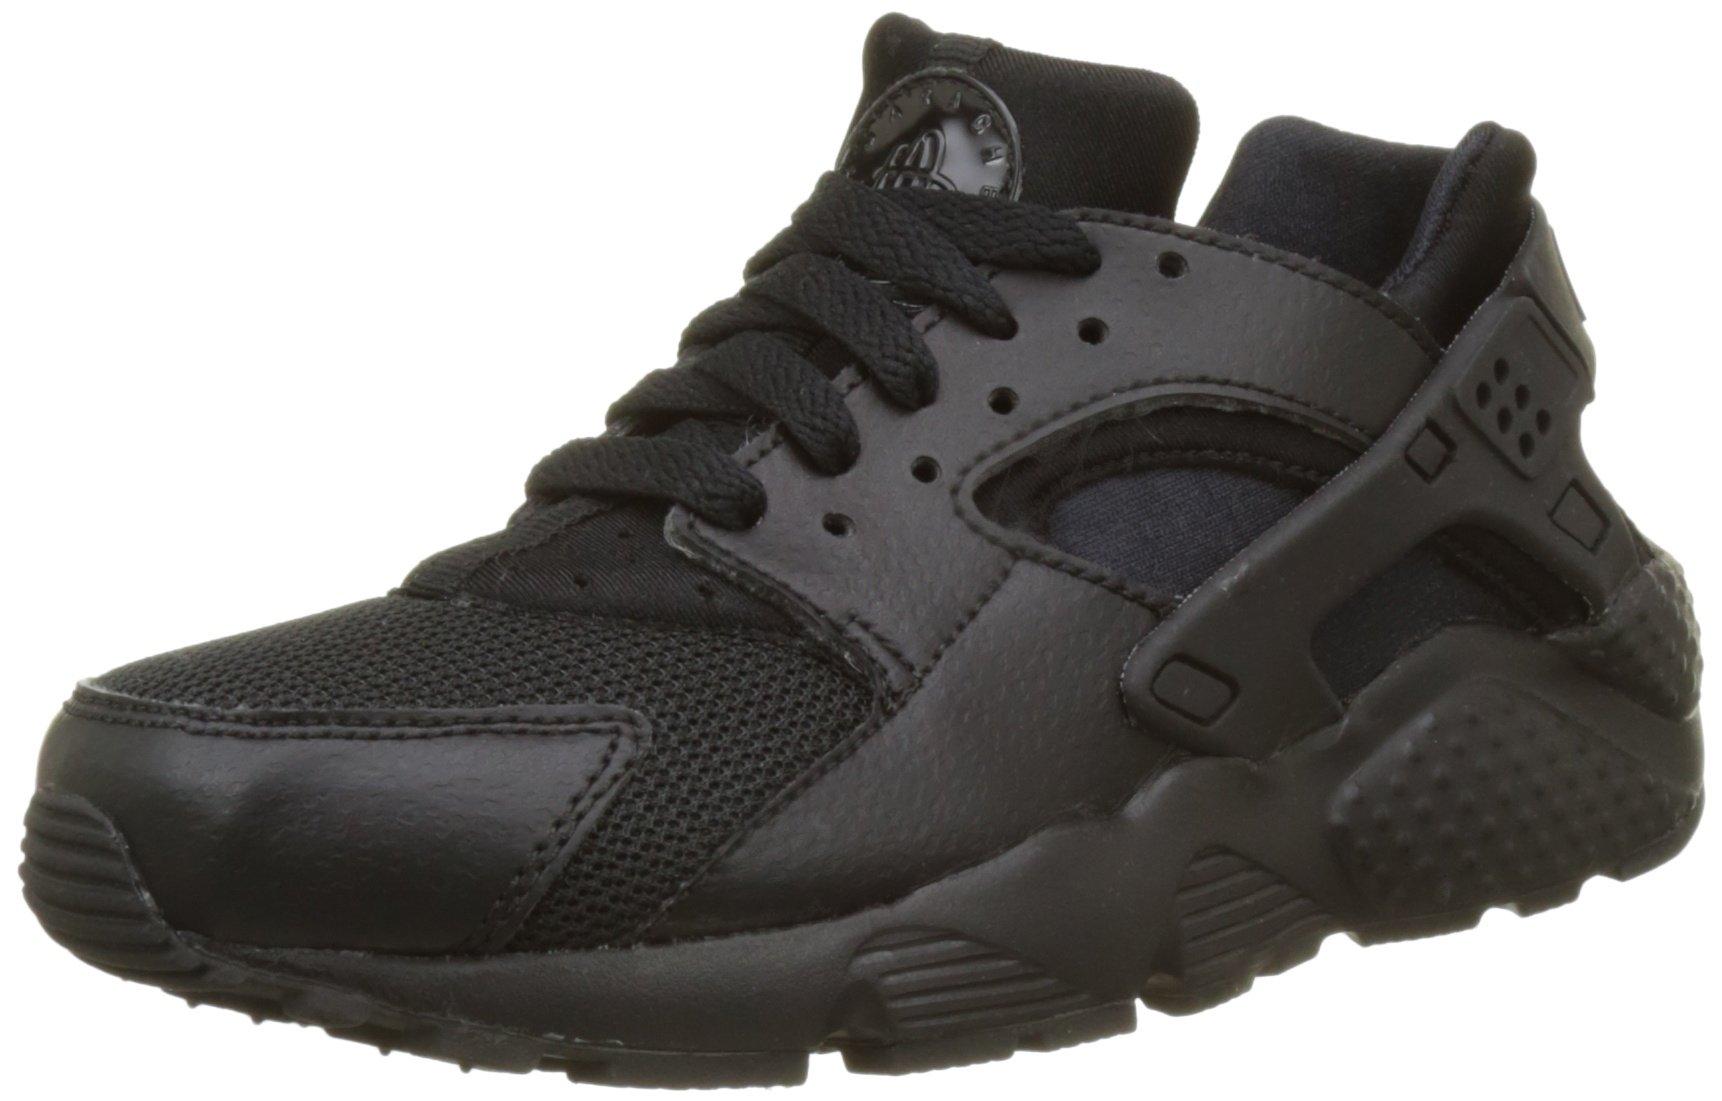 71ByMuh5SdL - Nike Huarache Run (GS), Boys' Running Shoes